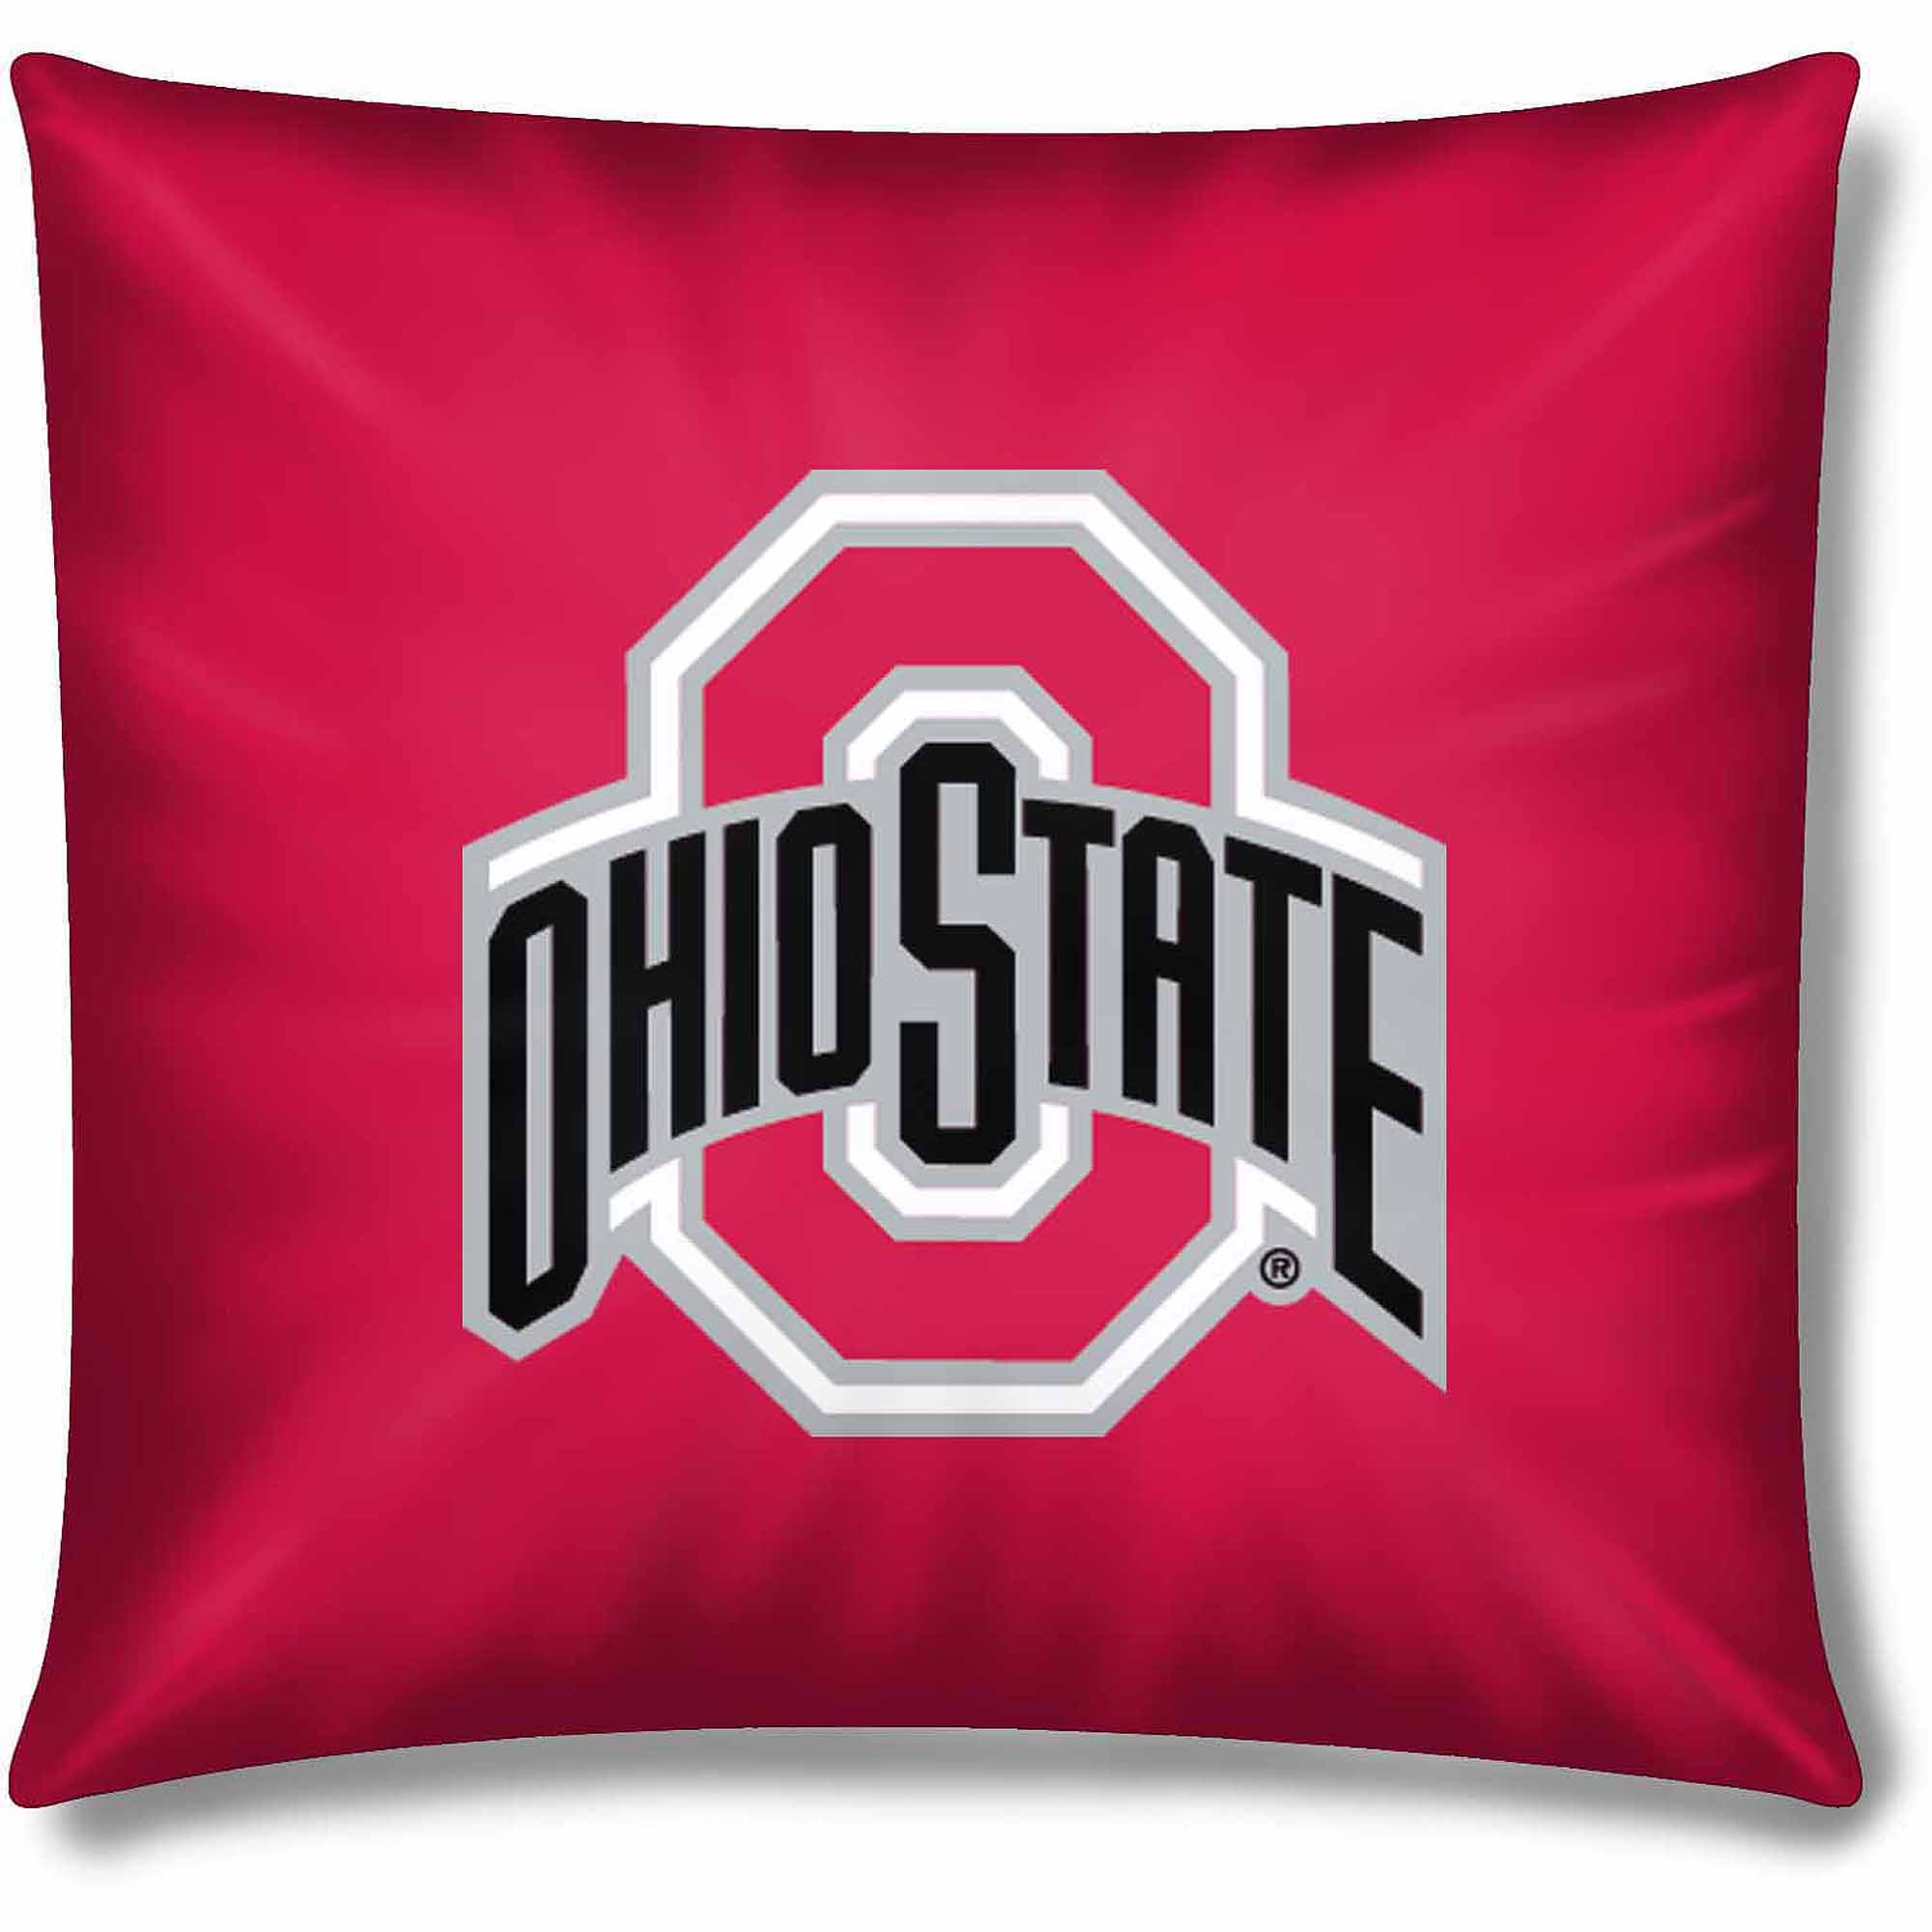 "NCAA Ohio State Buckeyes Official 15"" Toss Pillow"